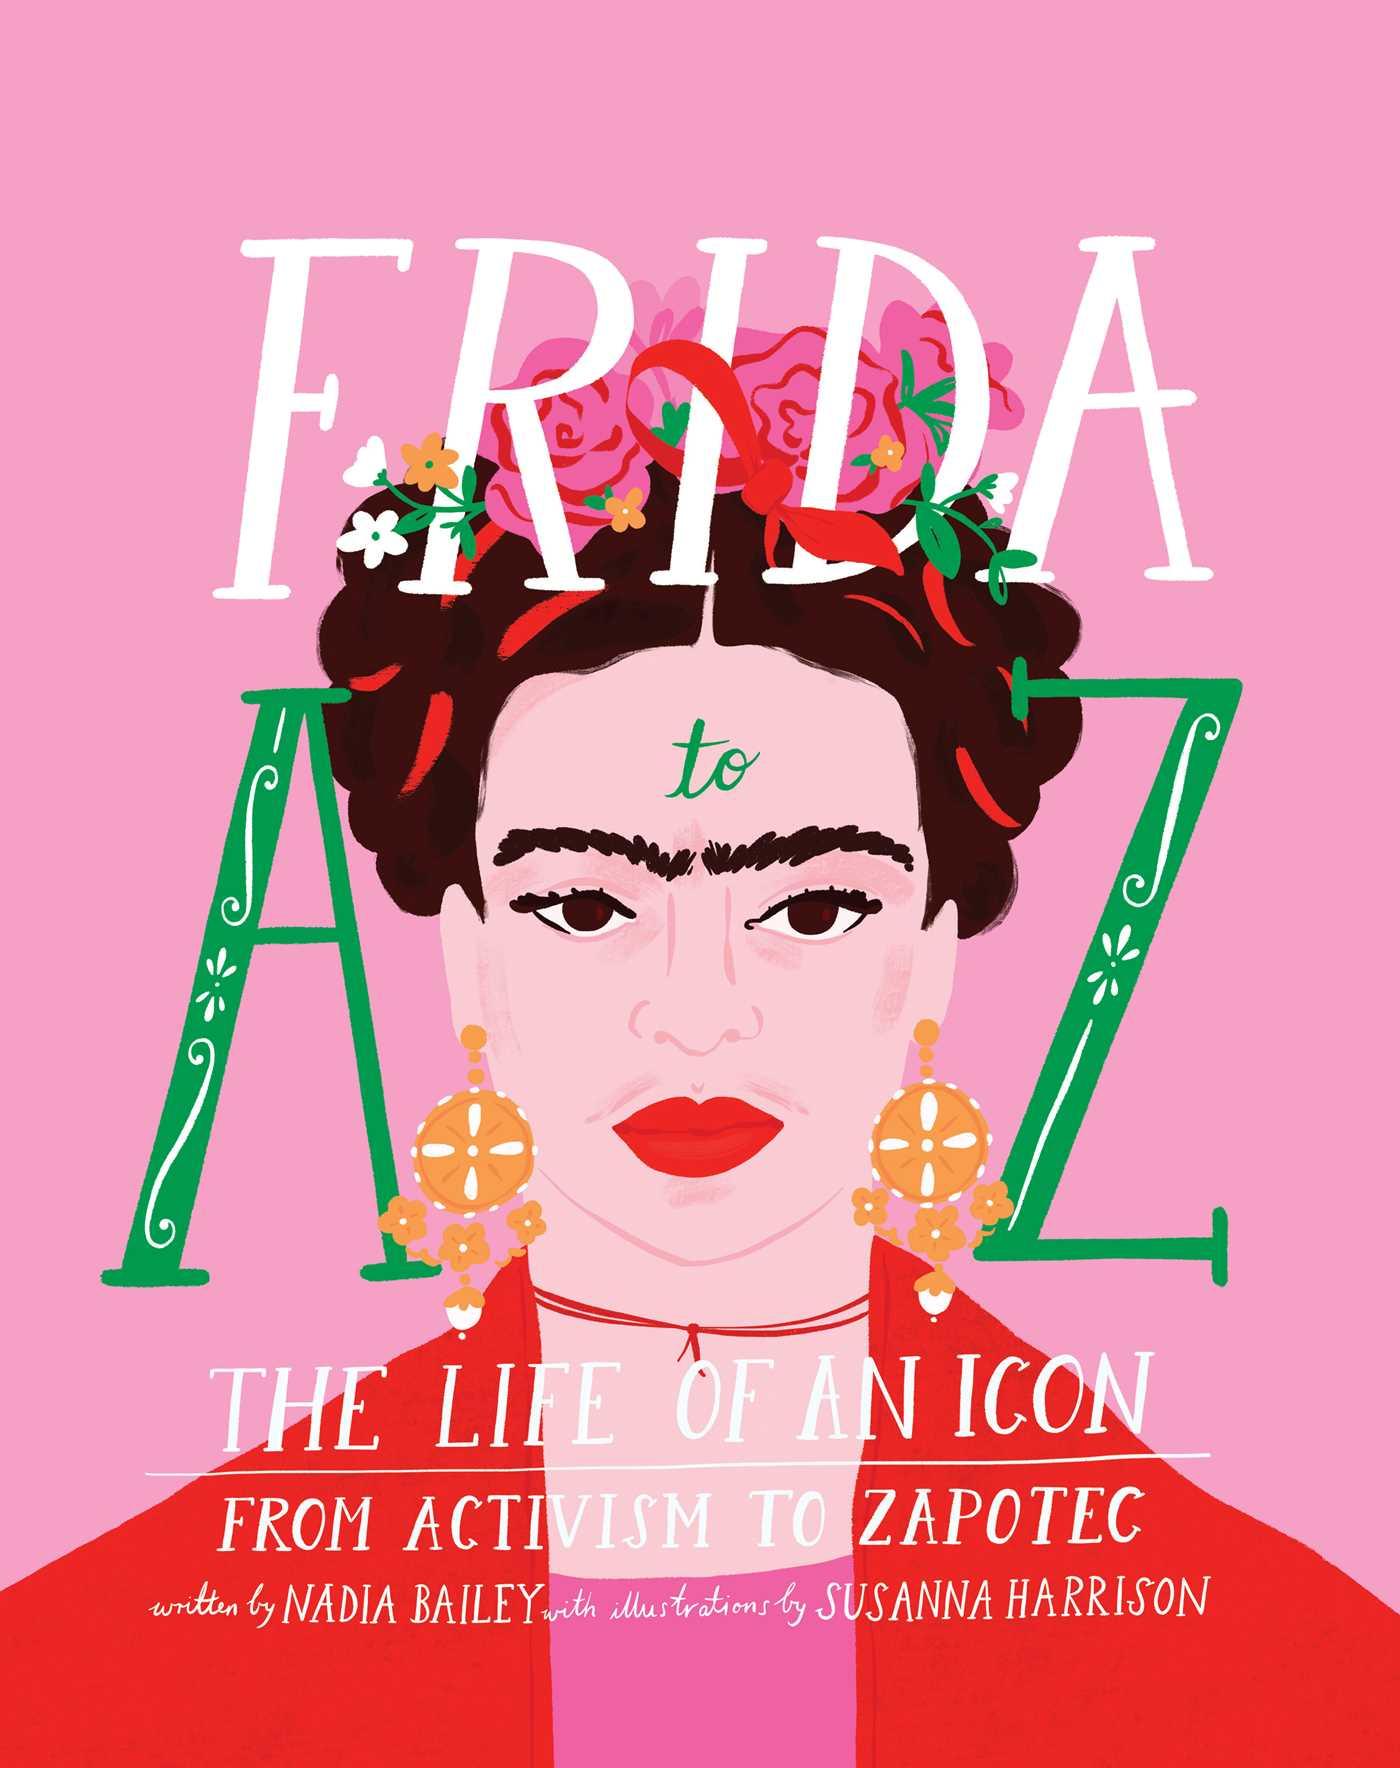 Frida A to Z by Nadia Bailey